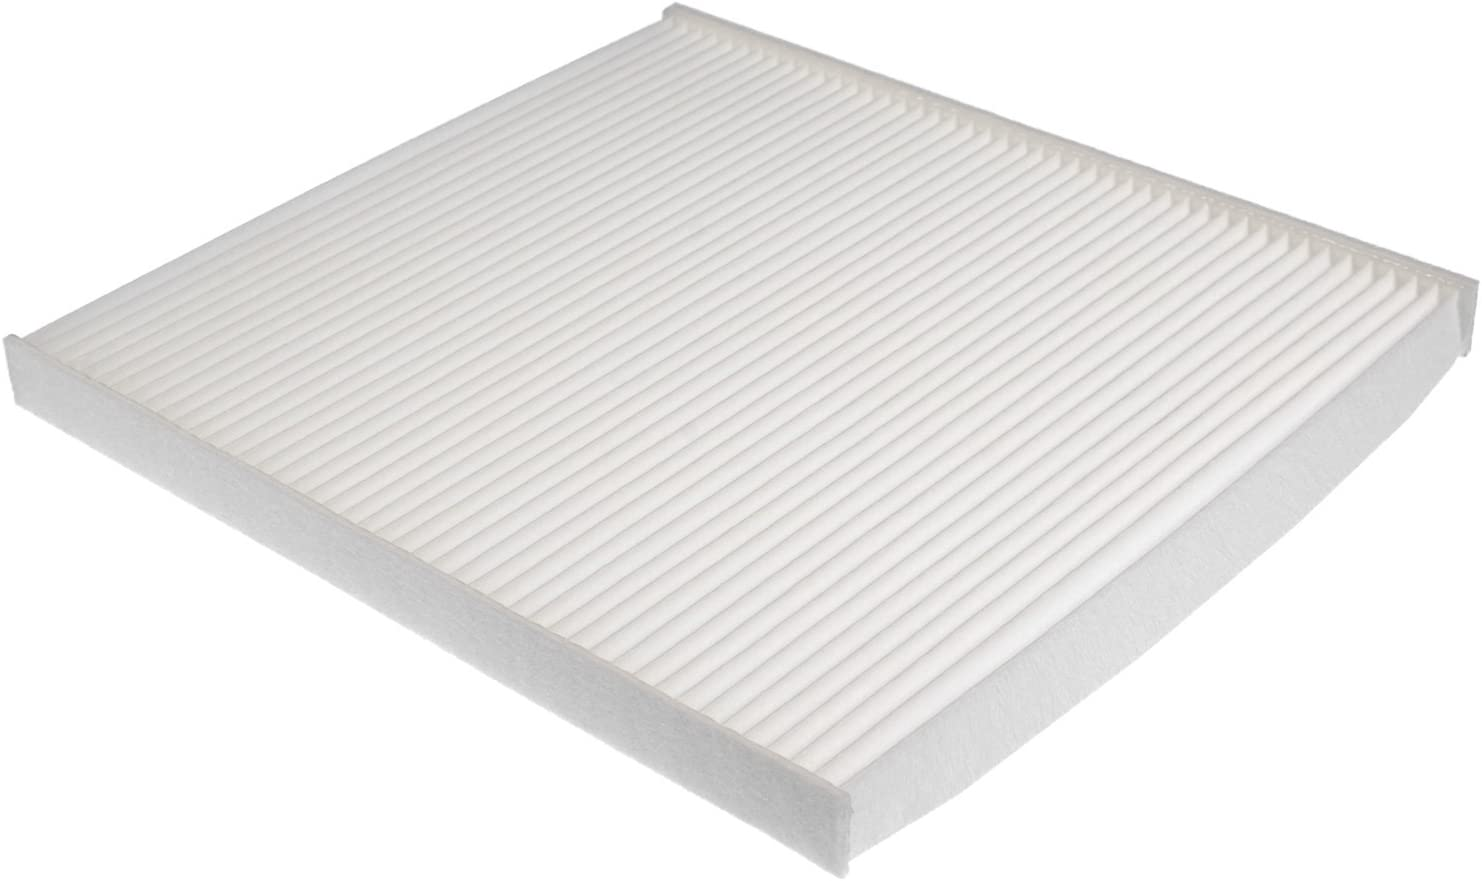 MAHLE LA 301 Cabin Air Filter